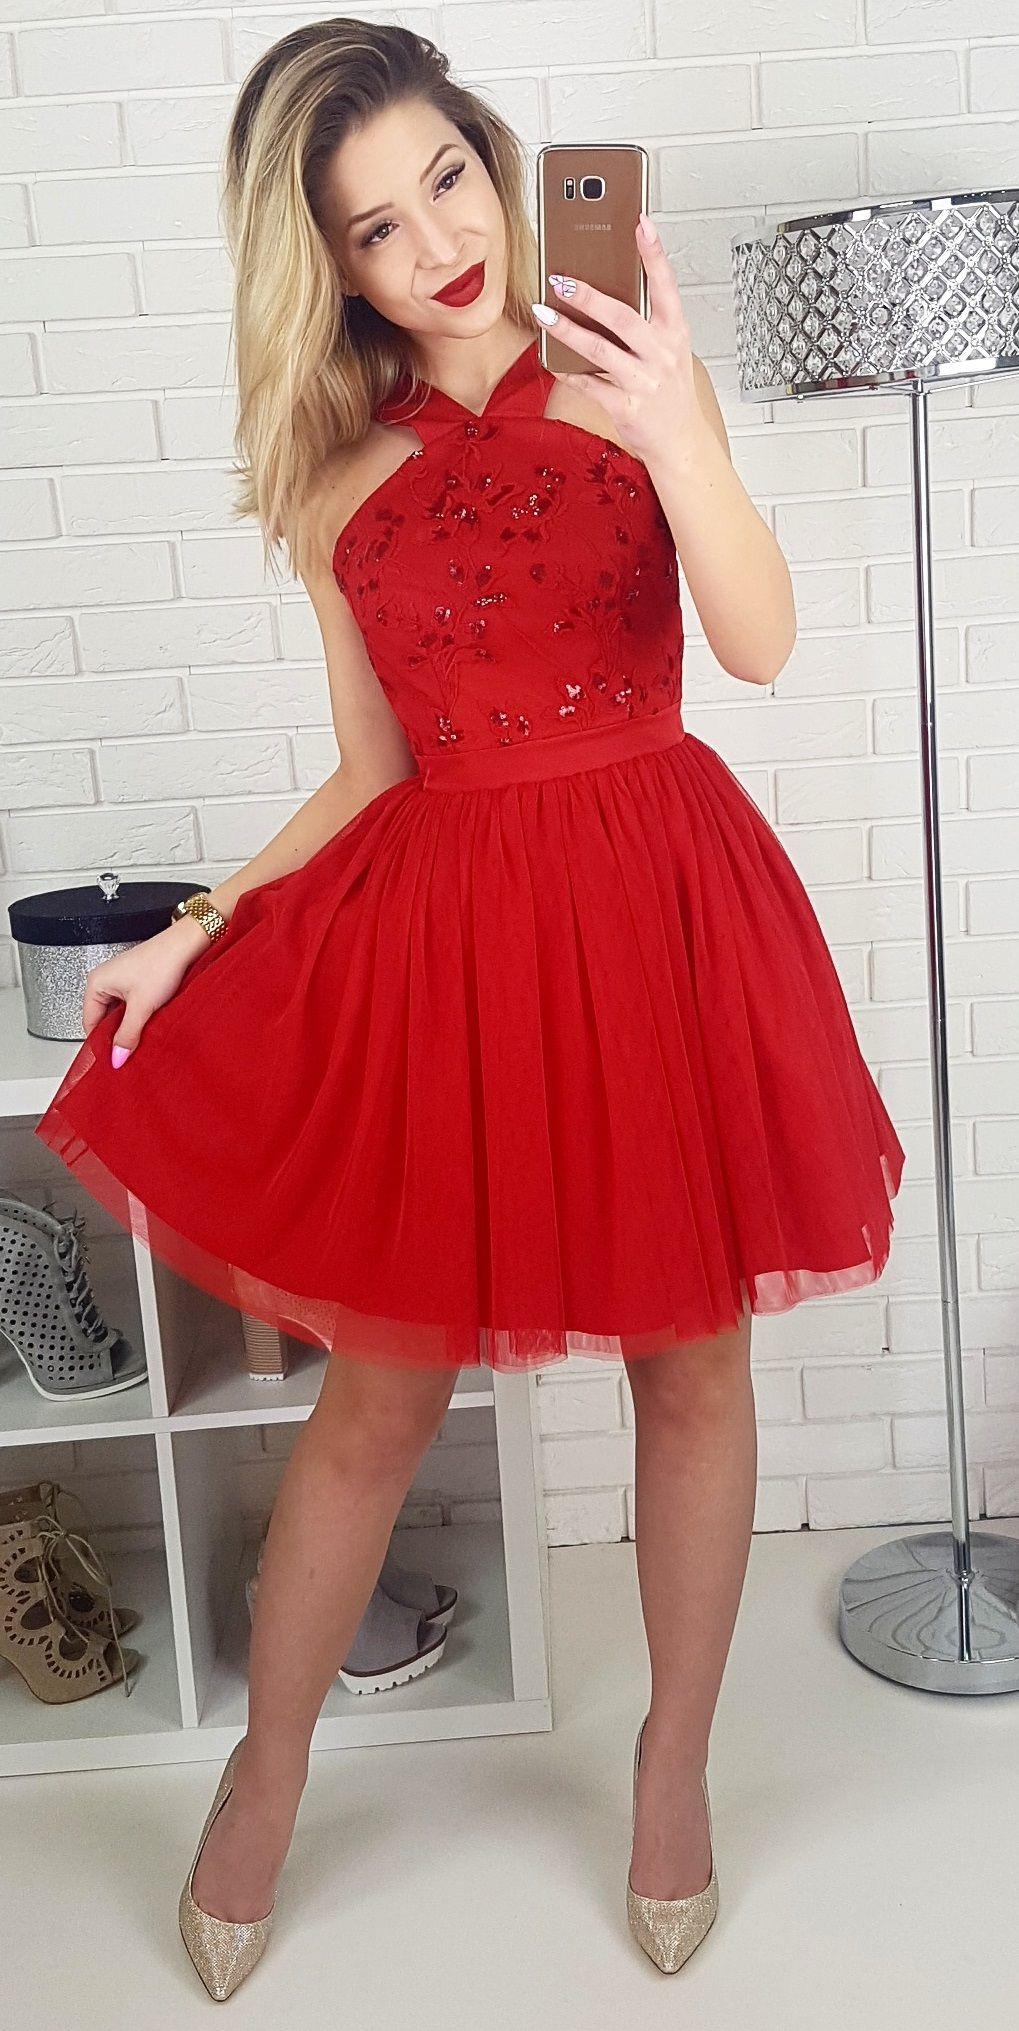 Czerwona Tiulowa Sukienka Na Wesele Red Bridesmaid Dresses Short Dresses Homecoming Dresses